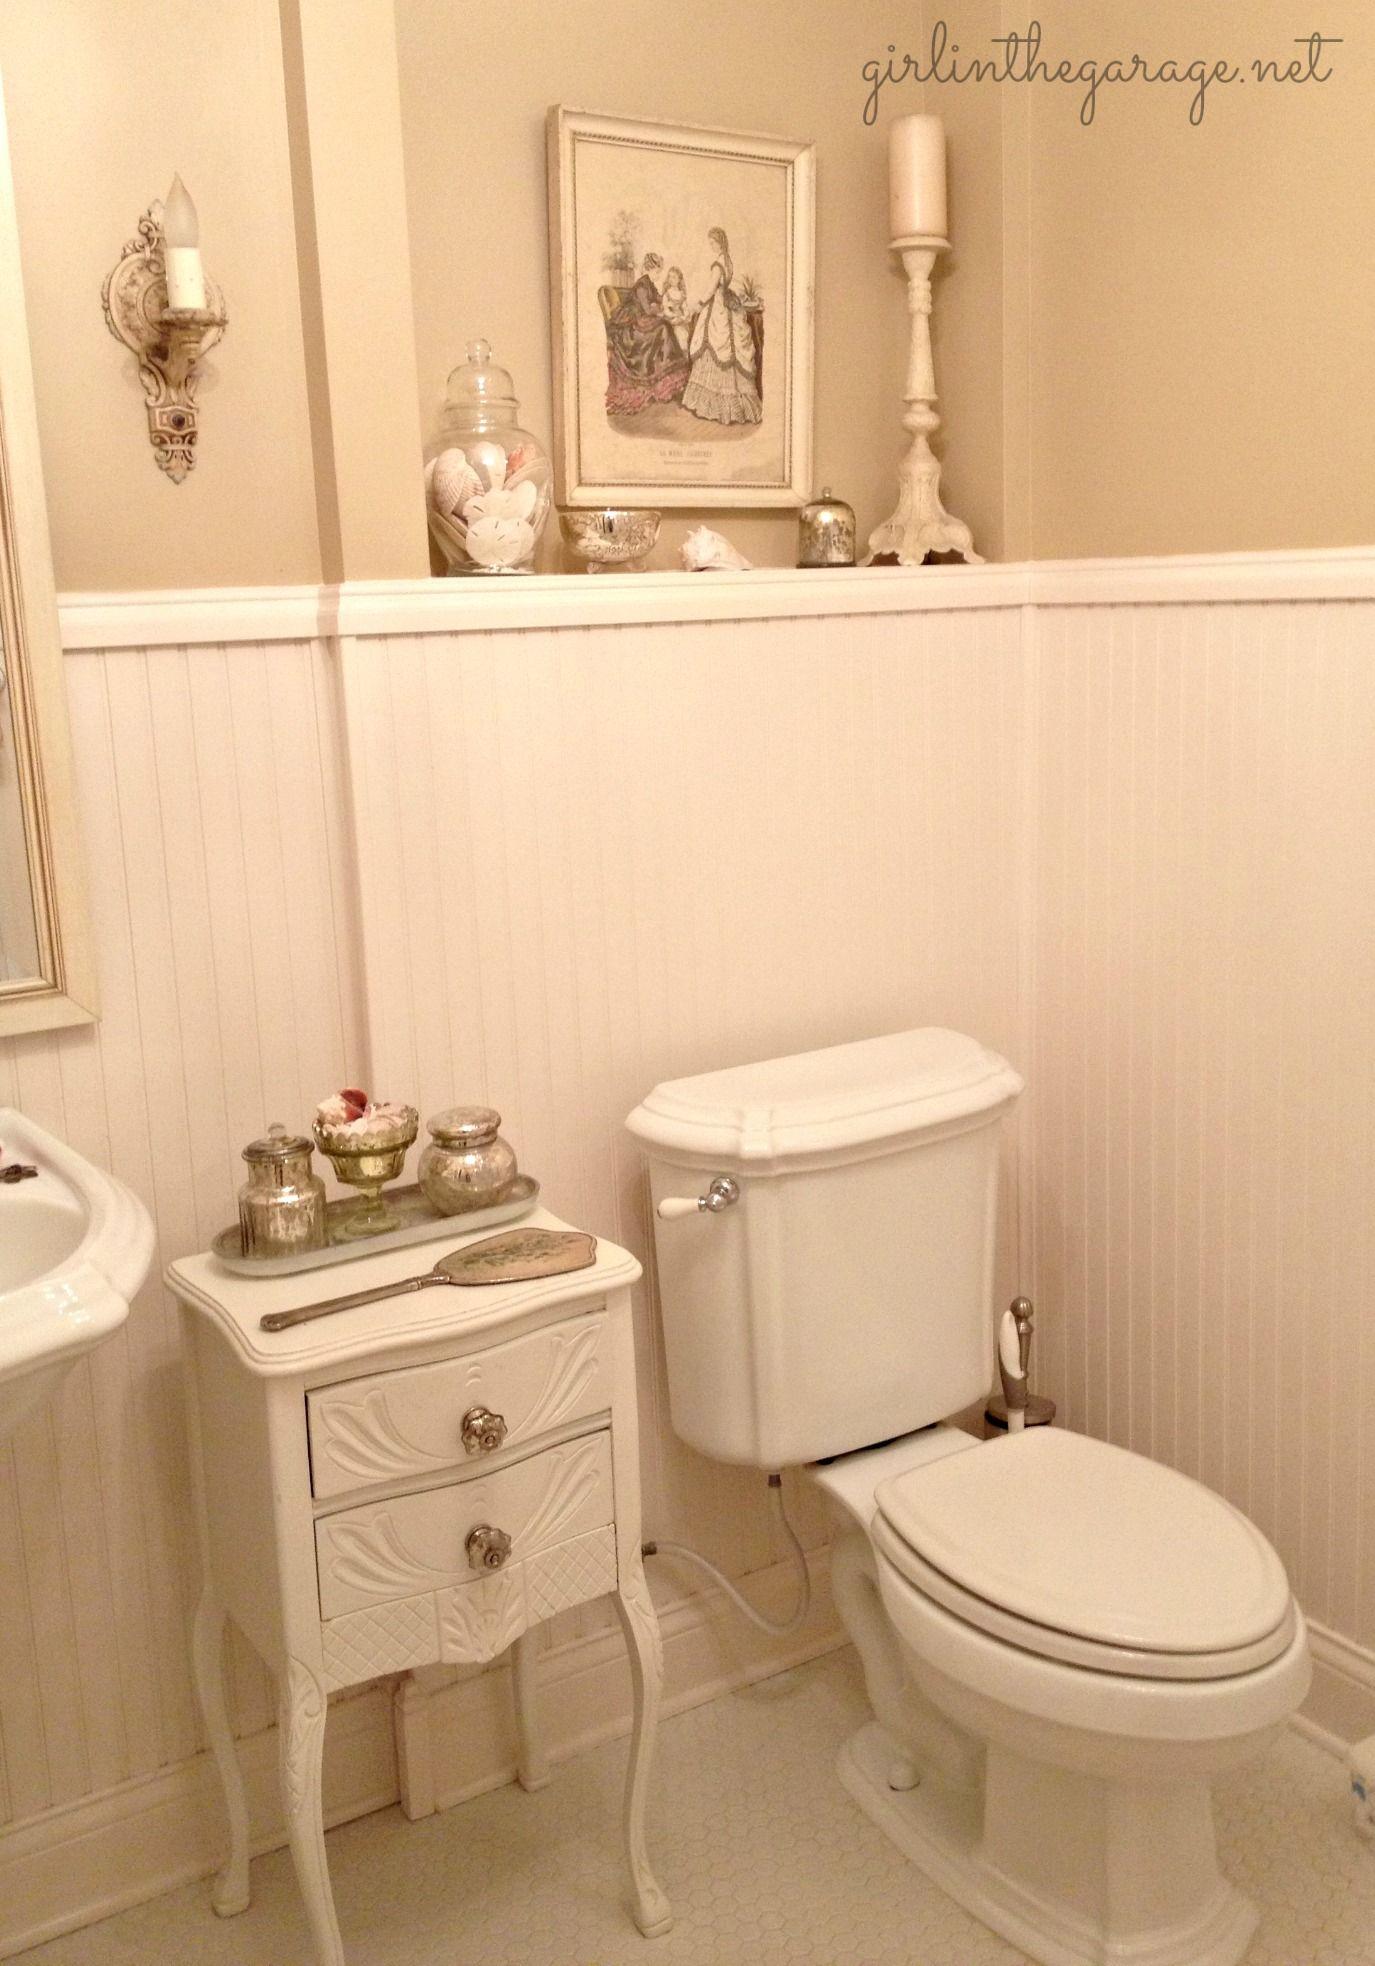 Home decor bathroom - Victorian Cottage Home Decor